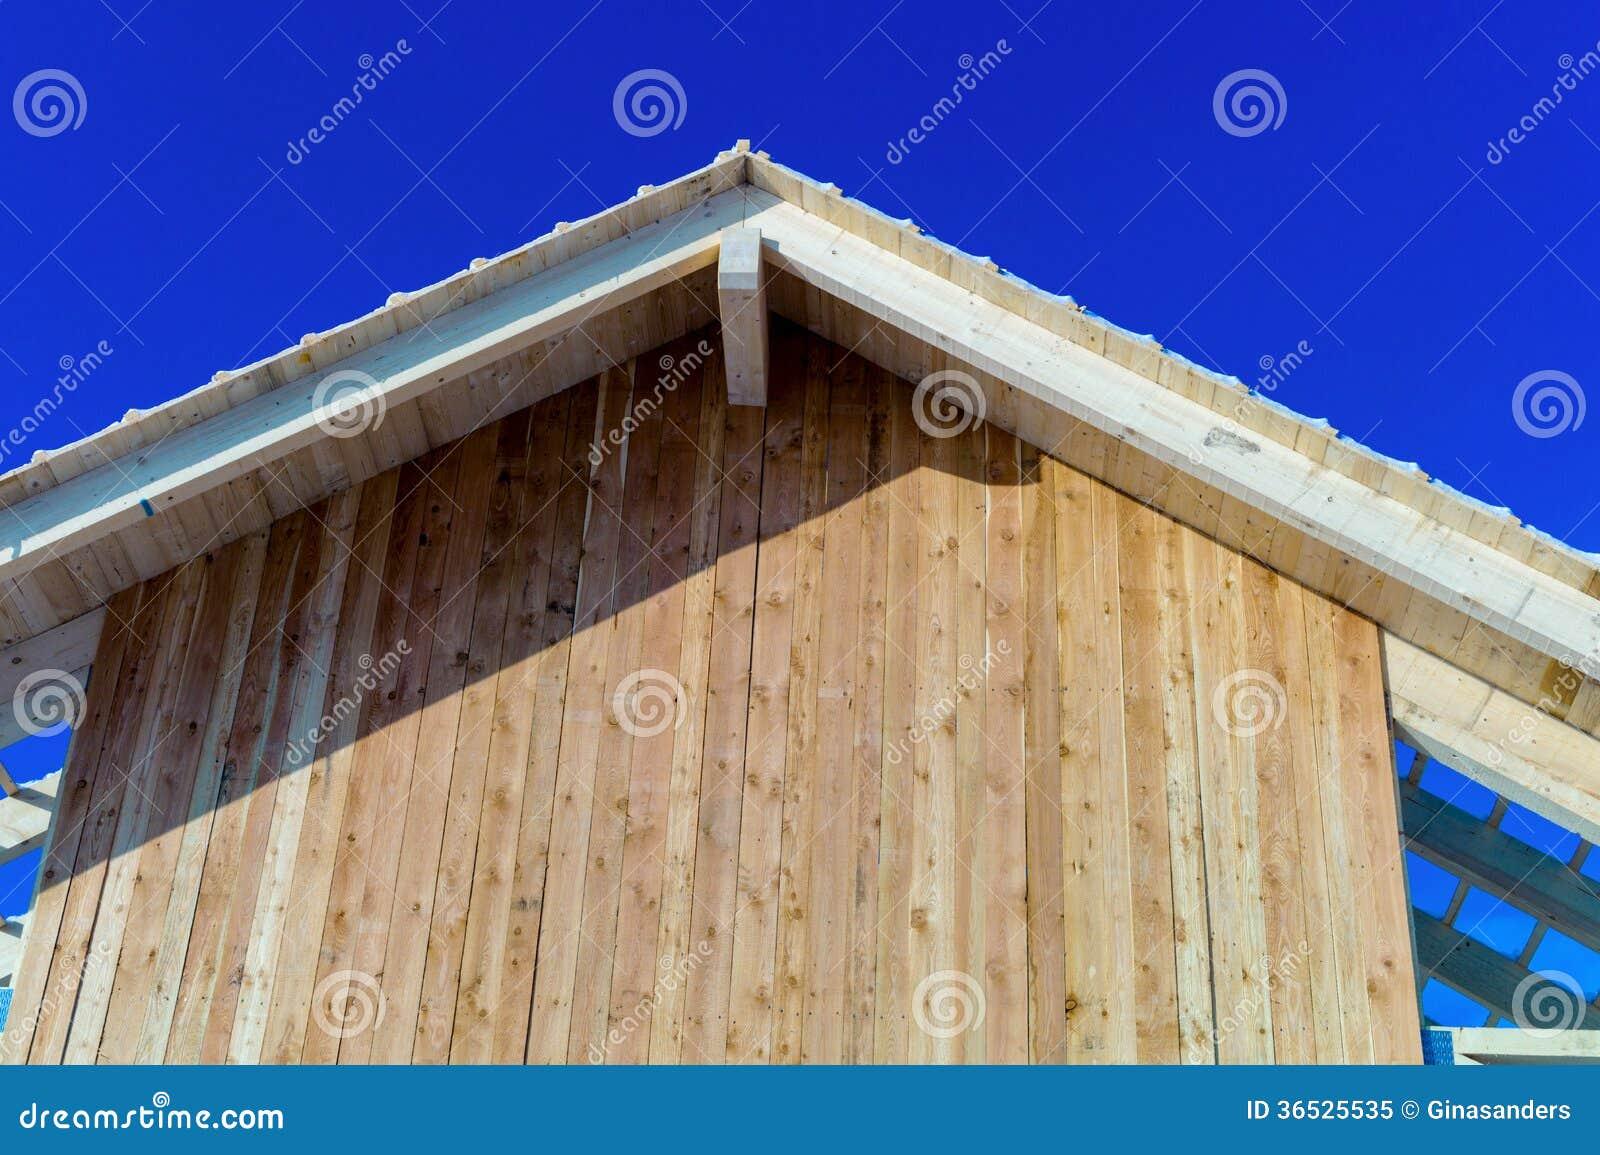 Construcci n de madera del tejado foto de archivo libre de for Tejados de madera construccion